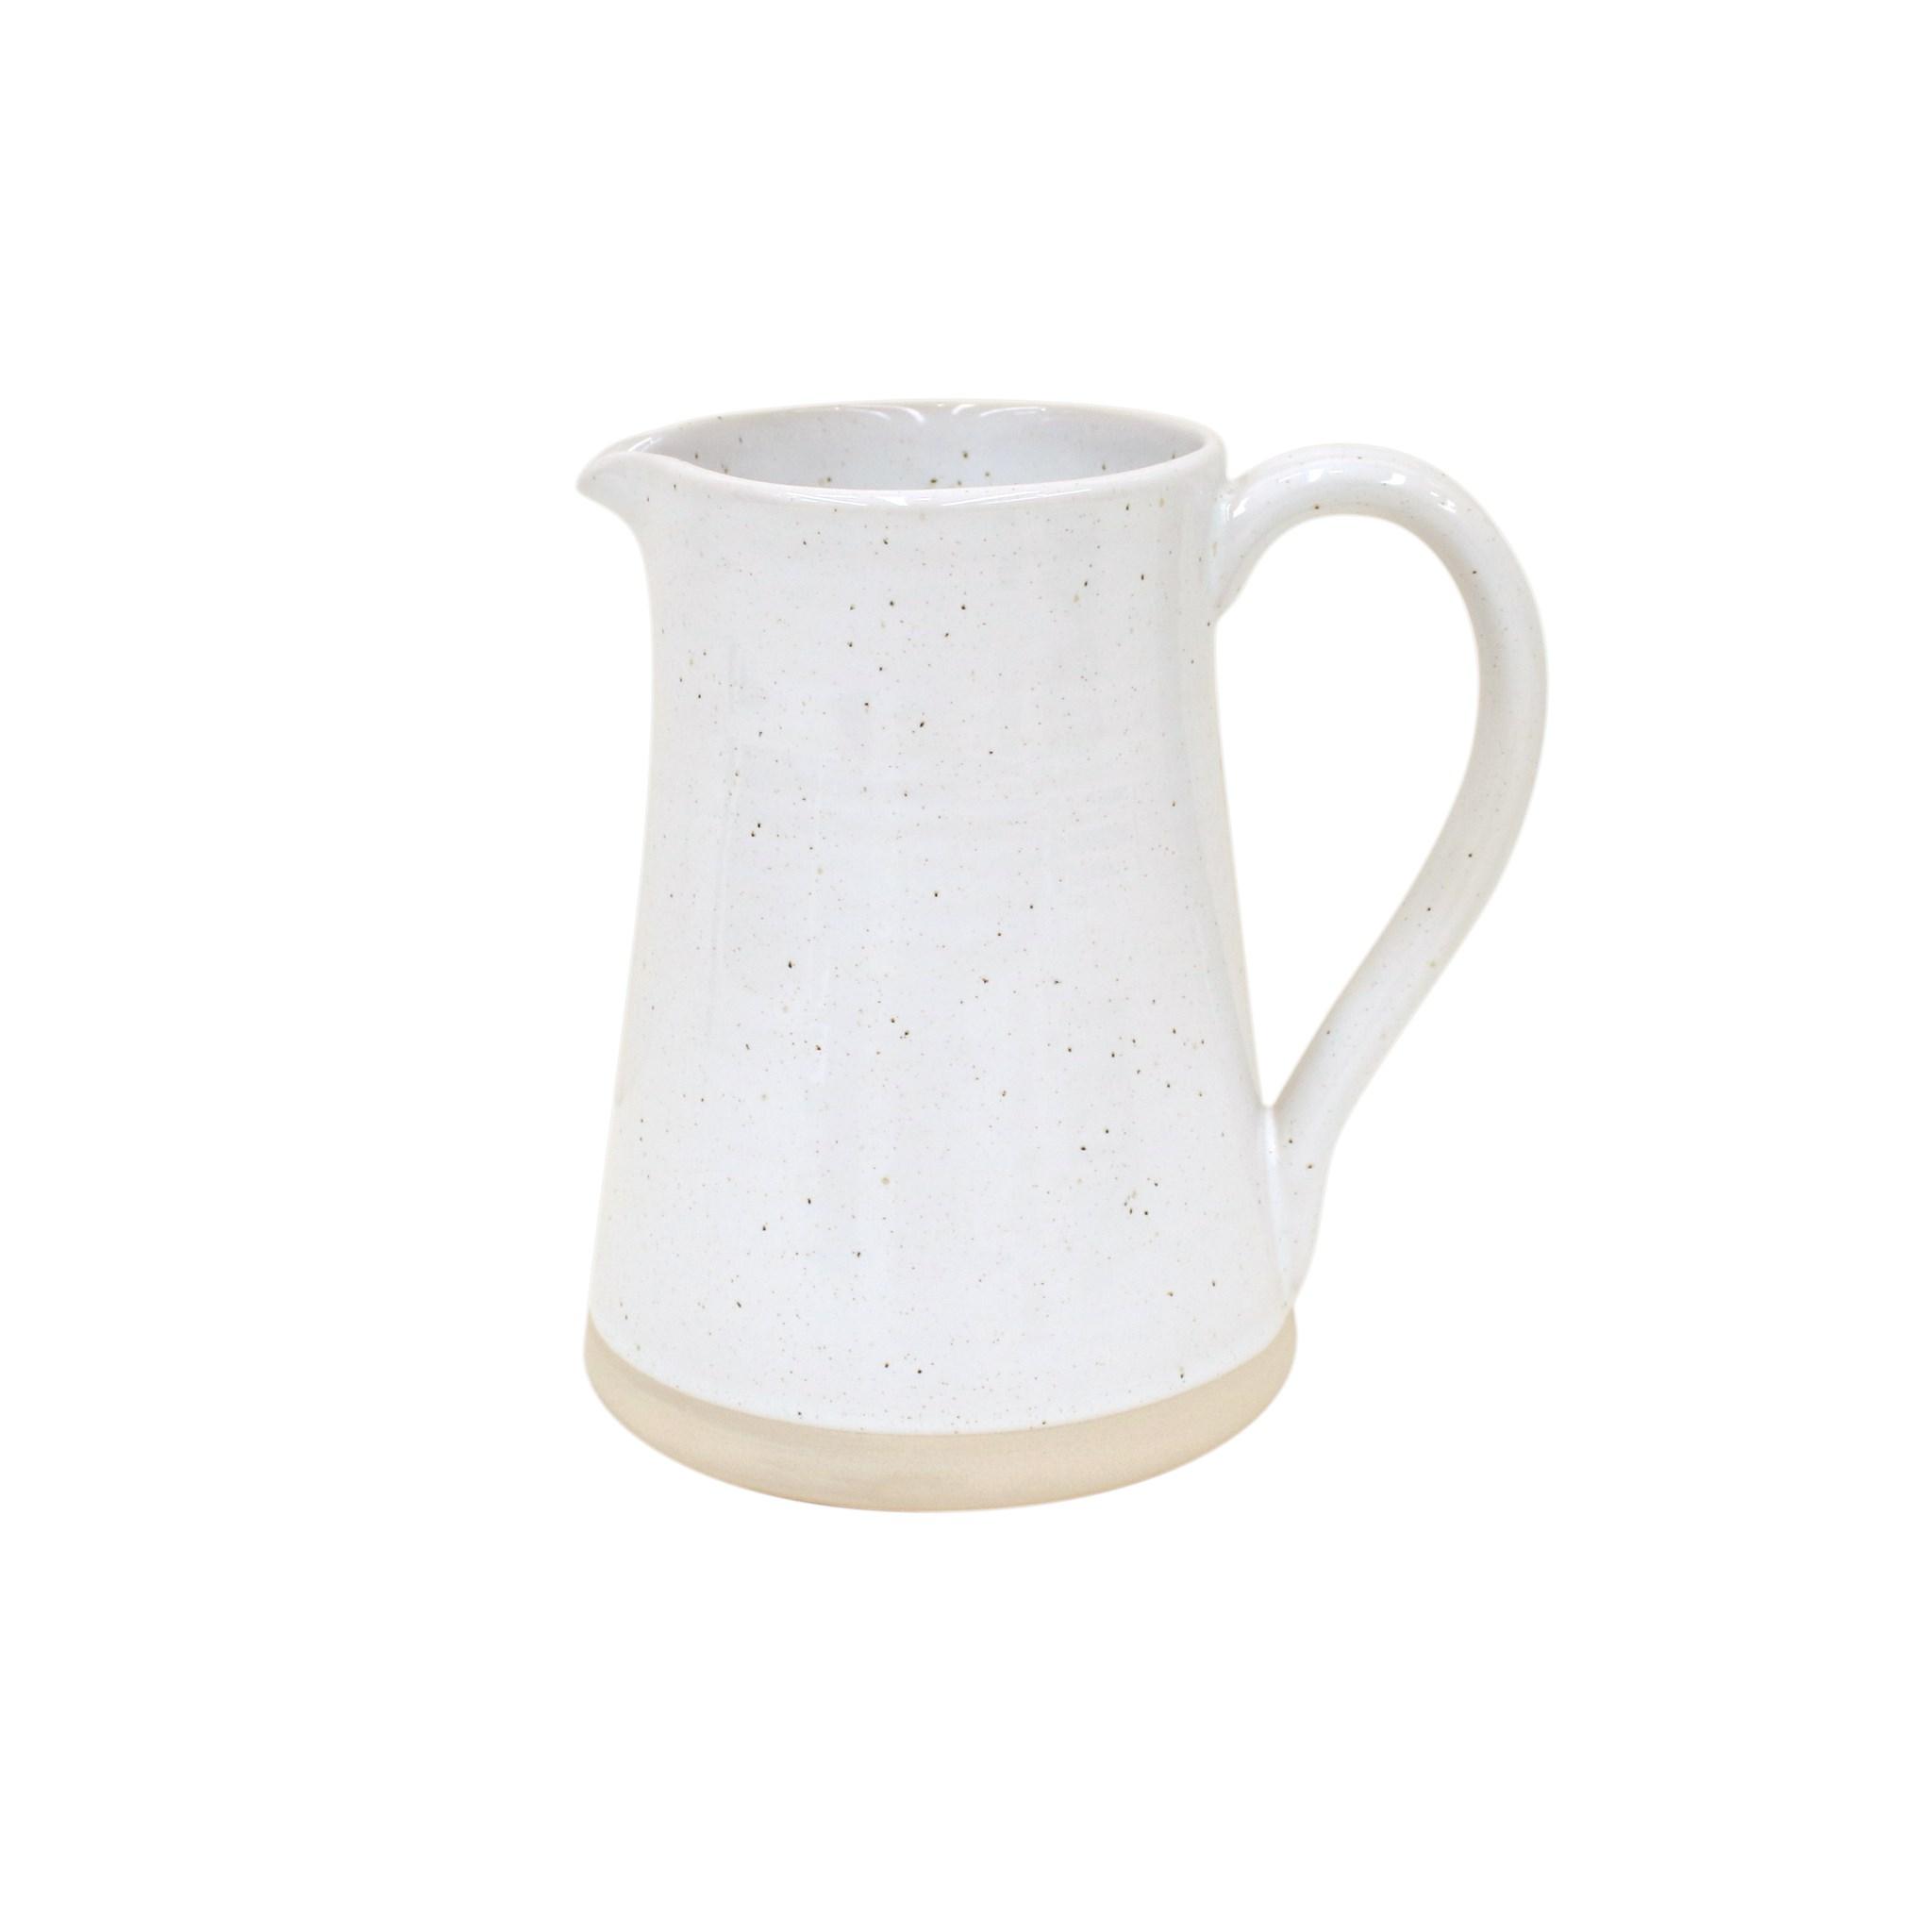 Florence stoneware pitcher